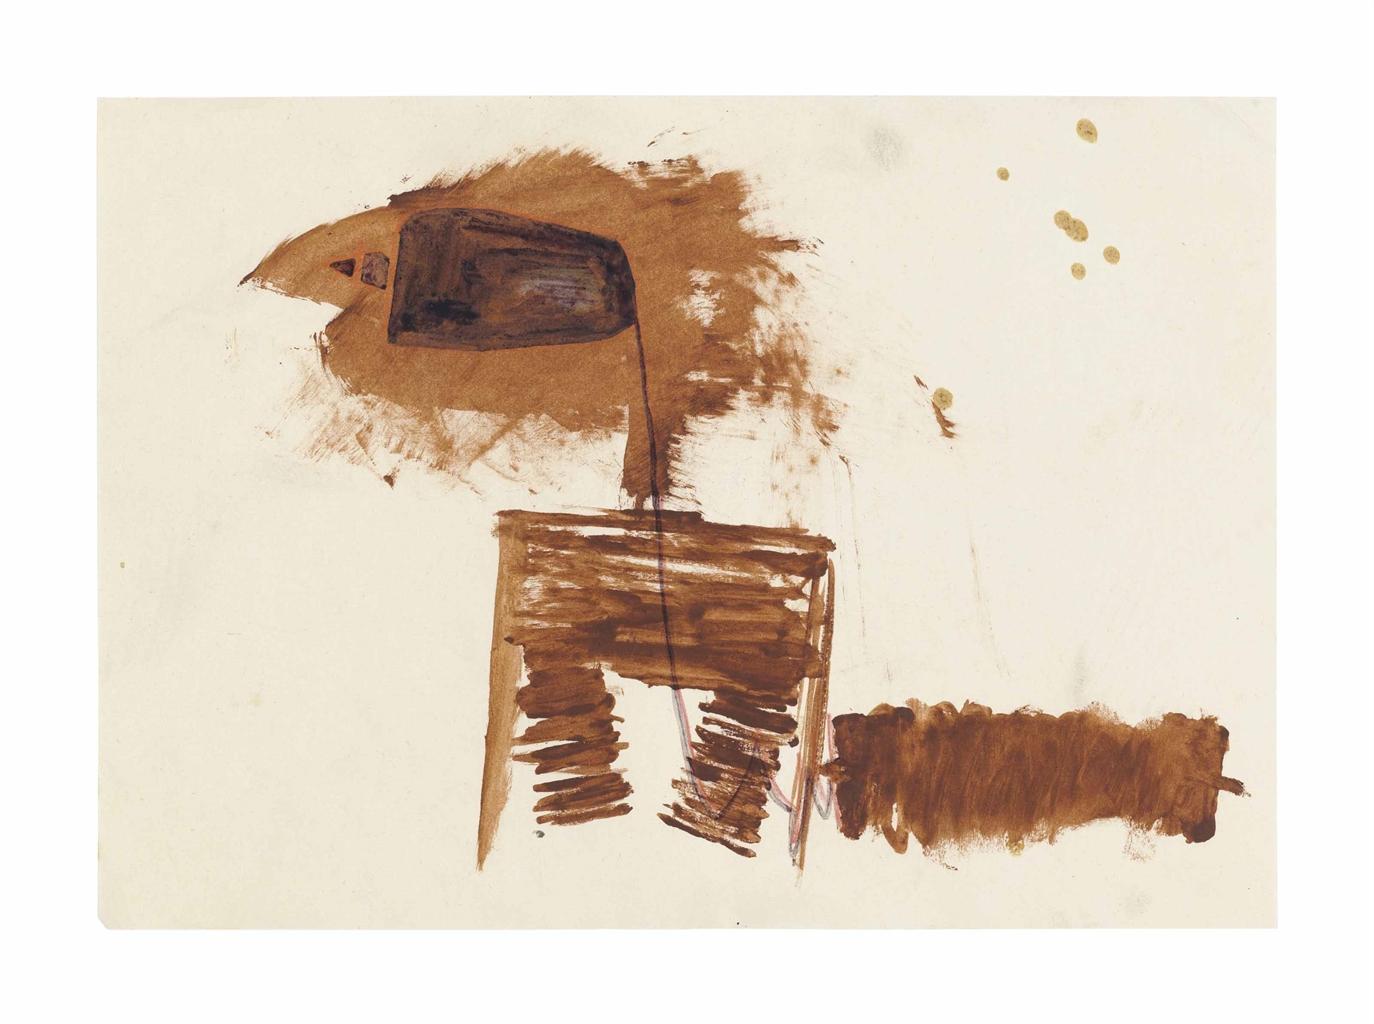 Joseph Beuys-Pol (Pole)-1962